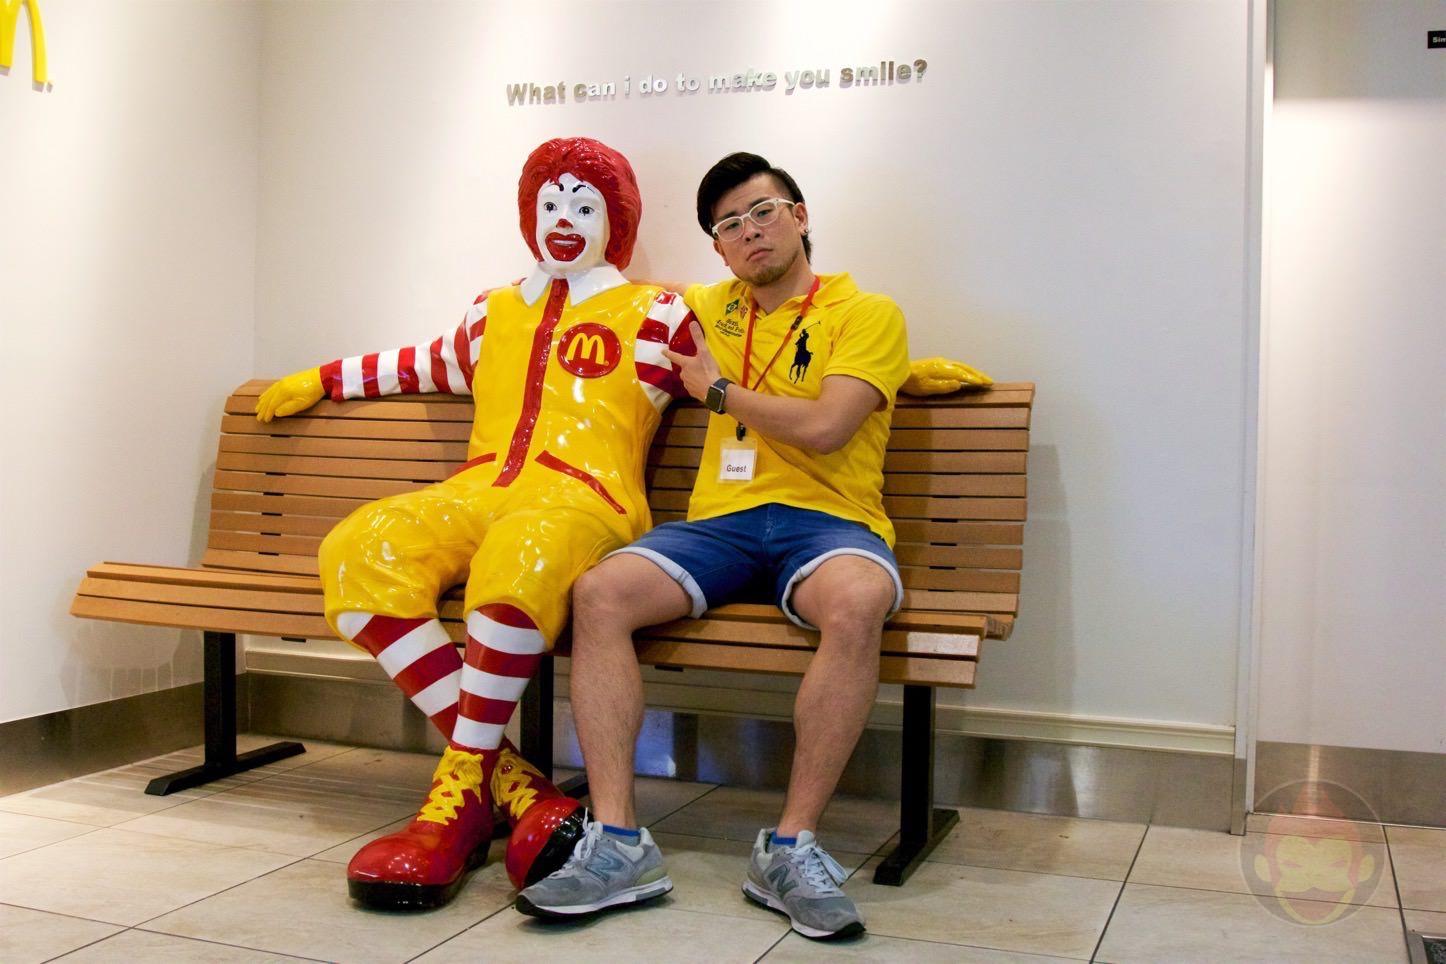 Hissho-Burger-McDonalds-Rio-01.jpg